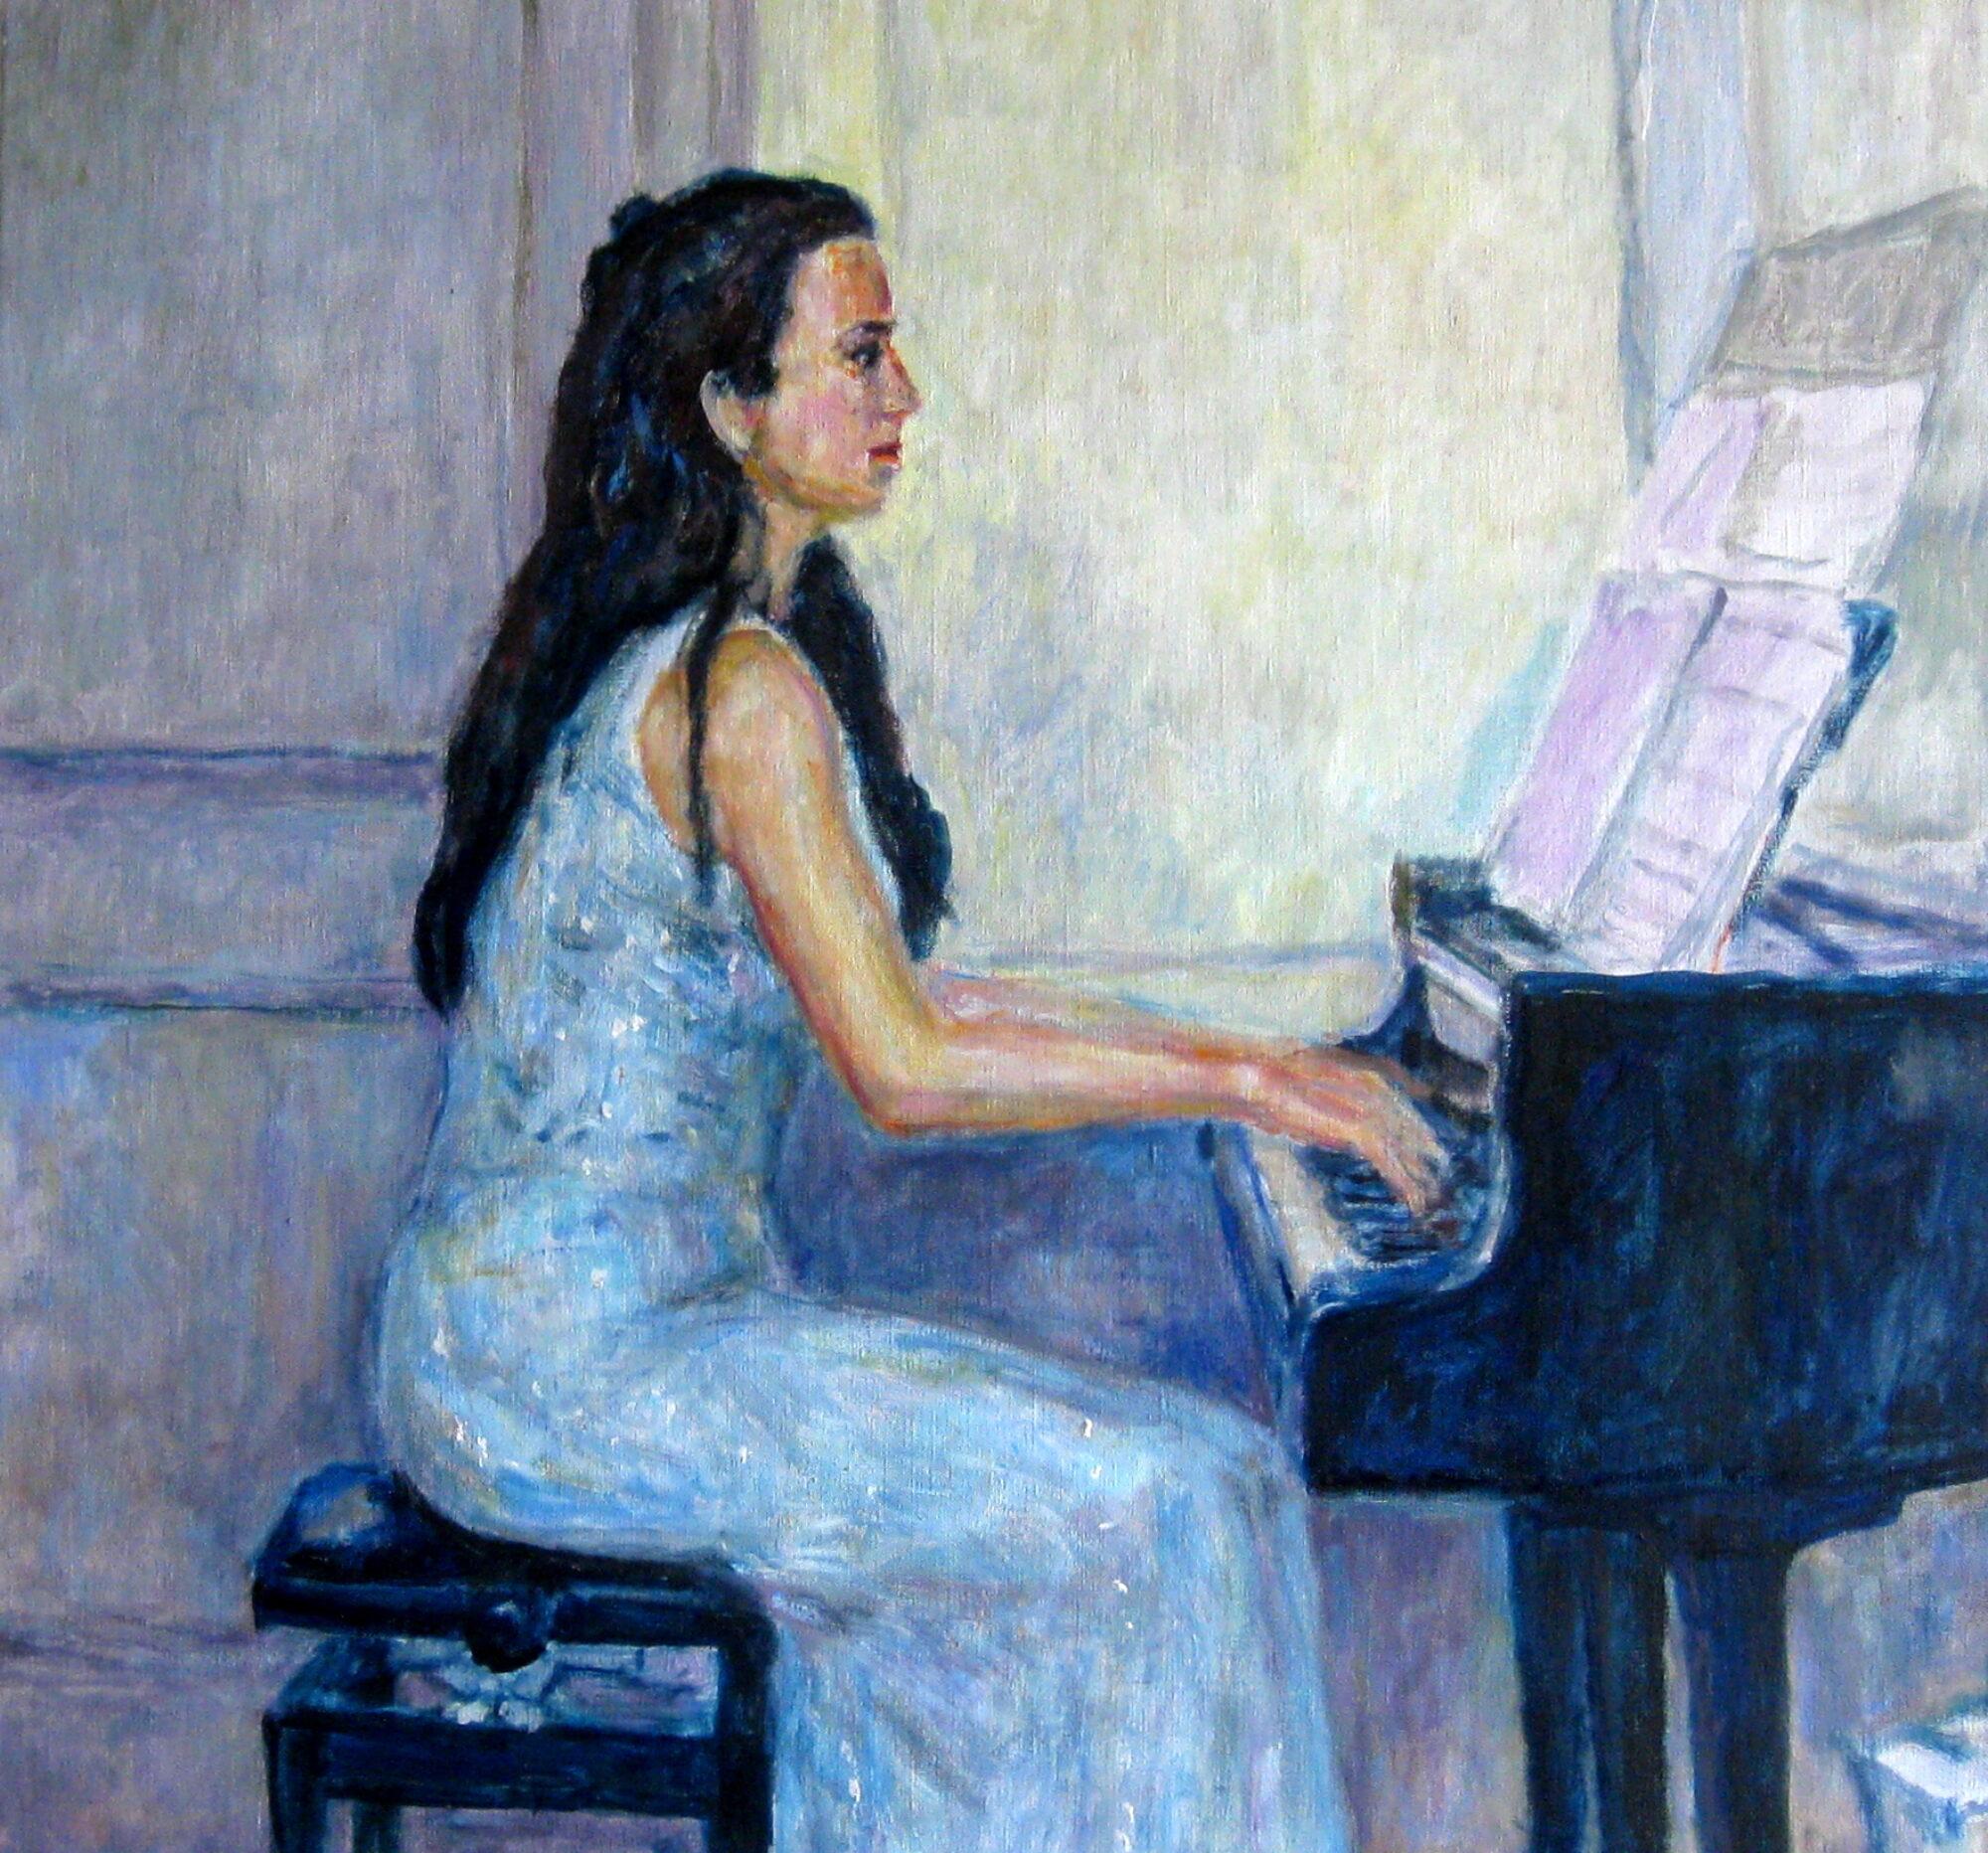 Susannah Snow